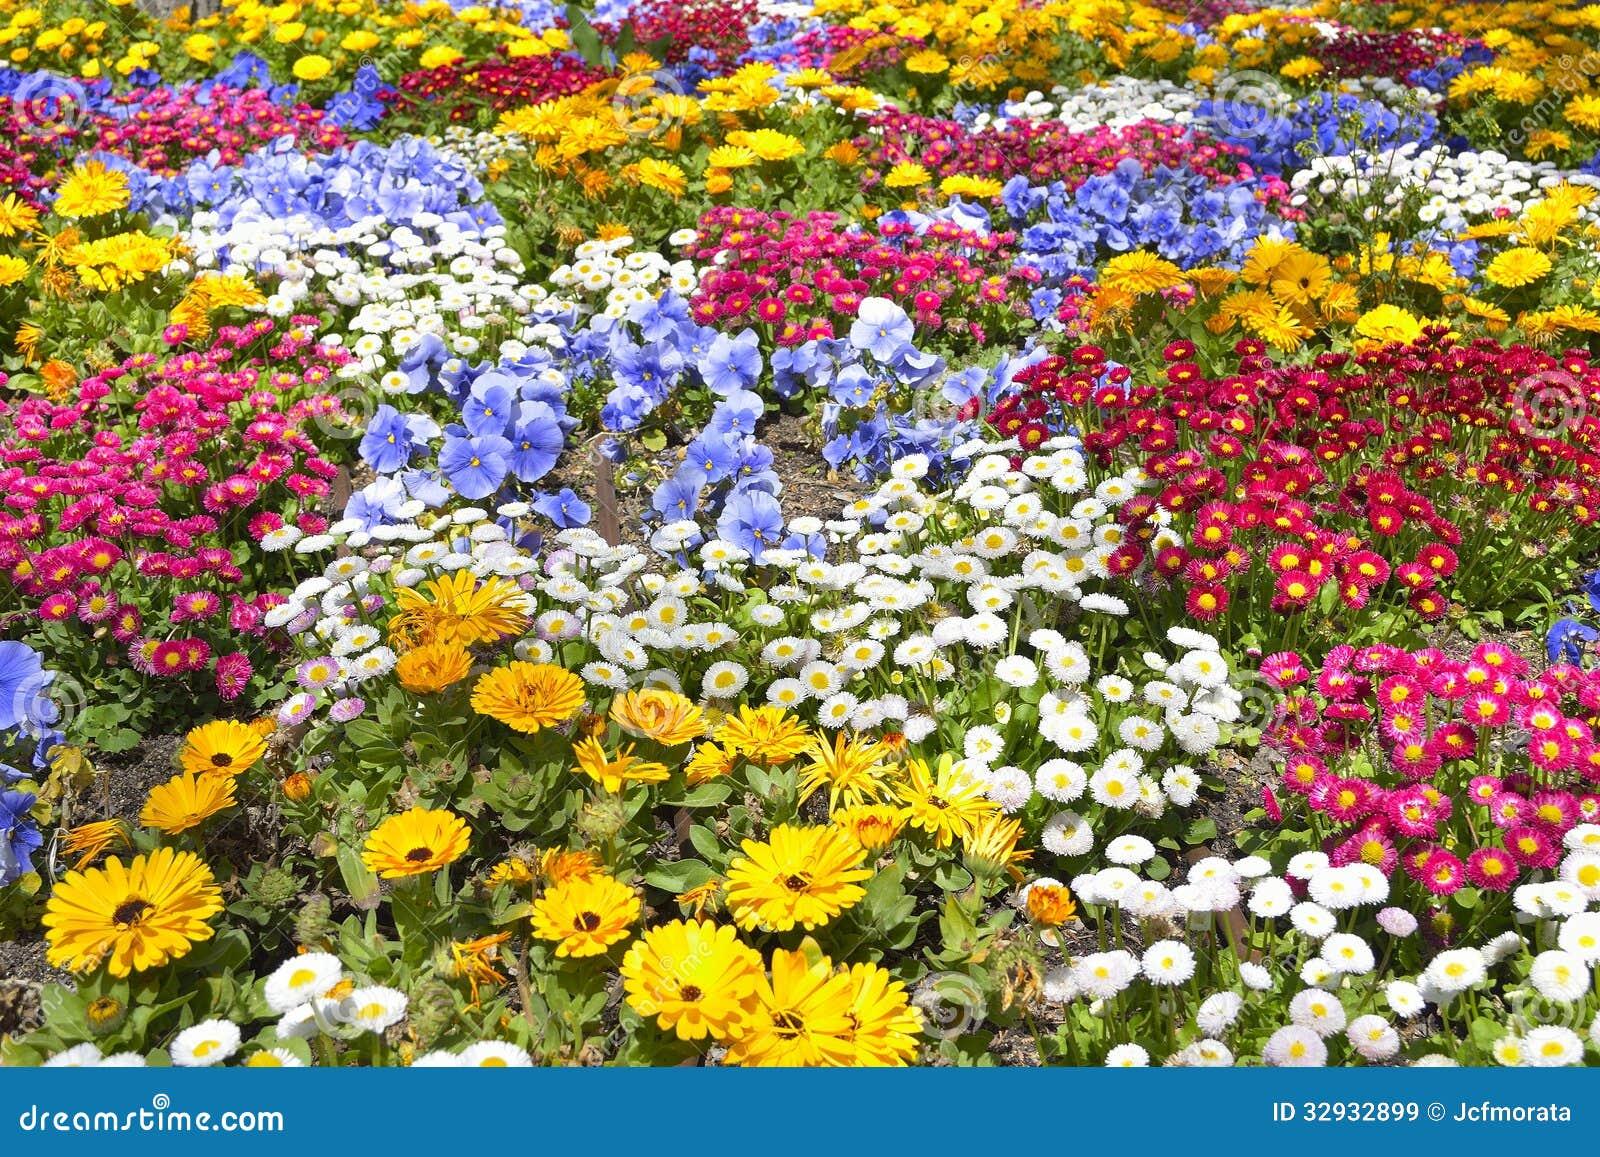 Download Flower Garden stock image. Image of orchids, spring, pollen - 32932899